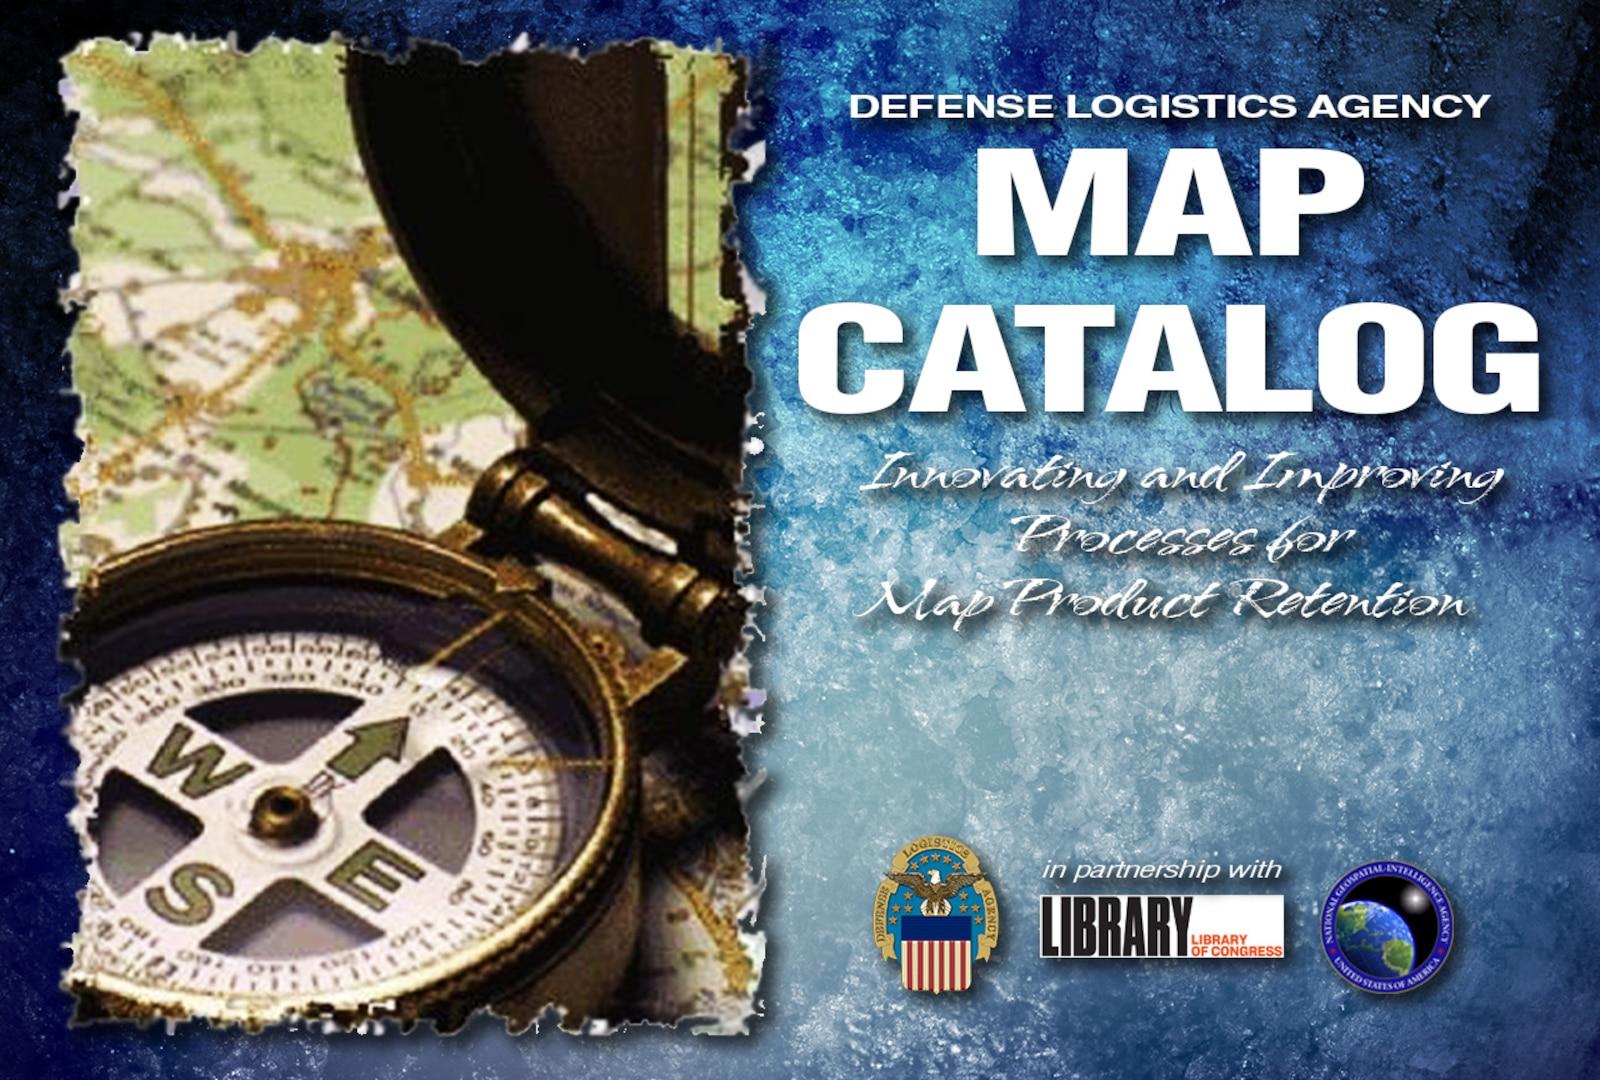 DLA Map Catalog graphic/compass image